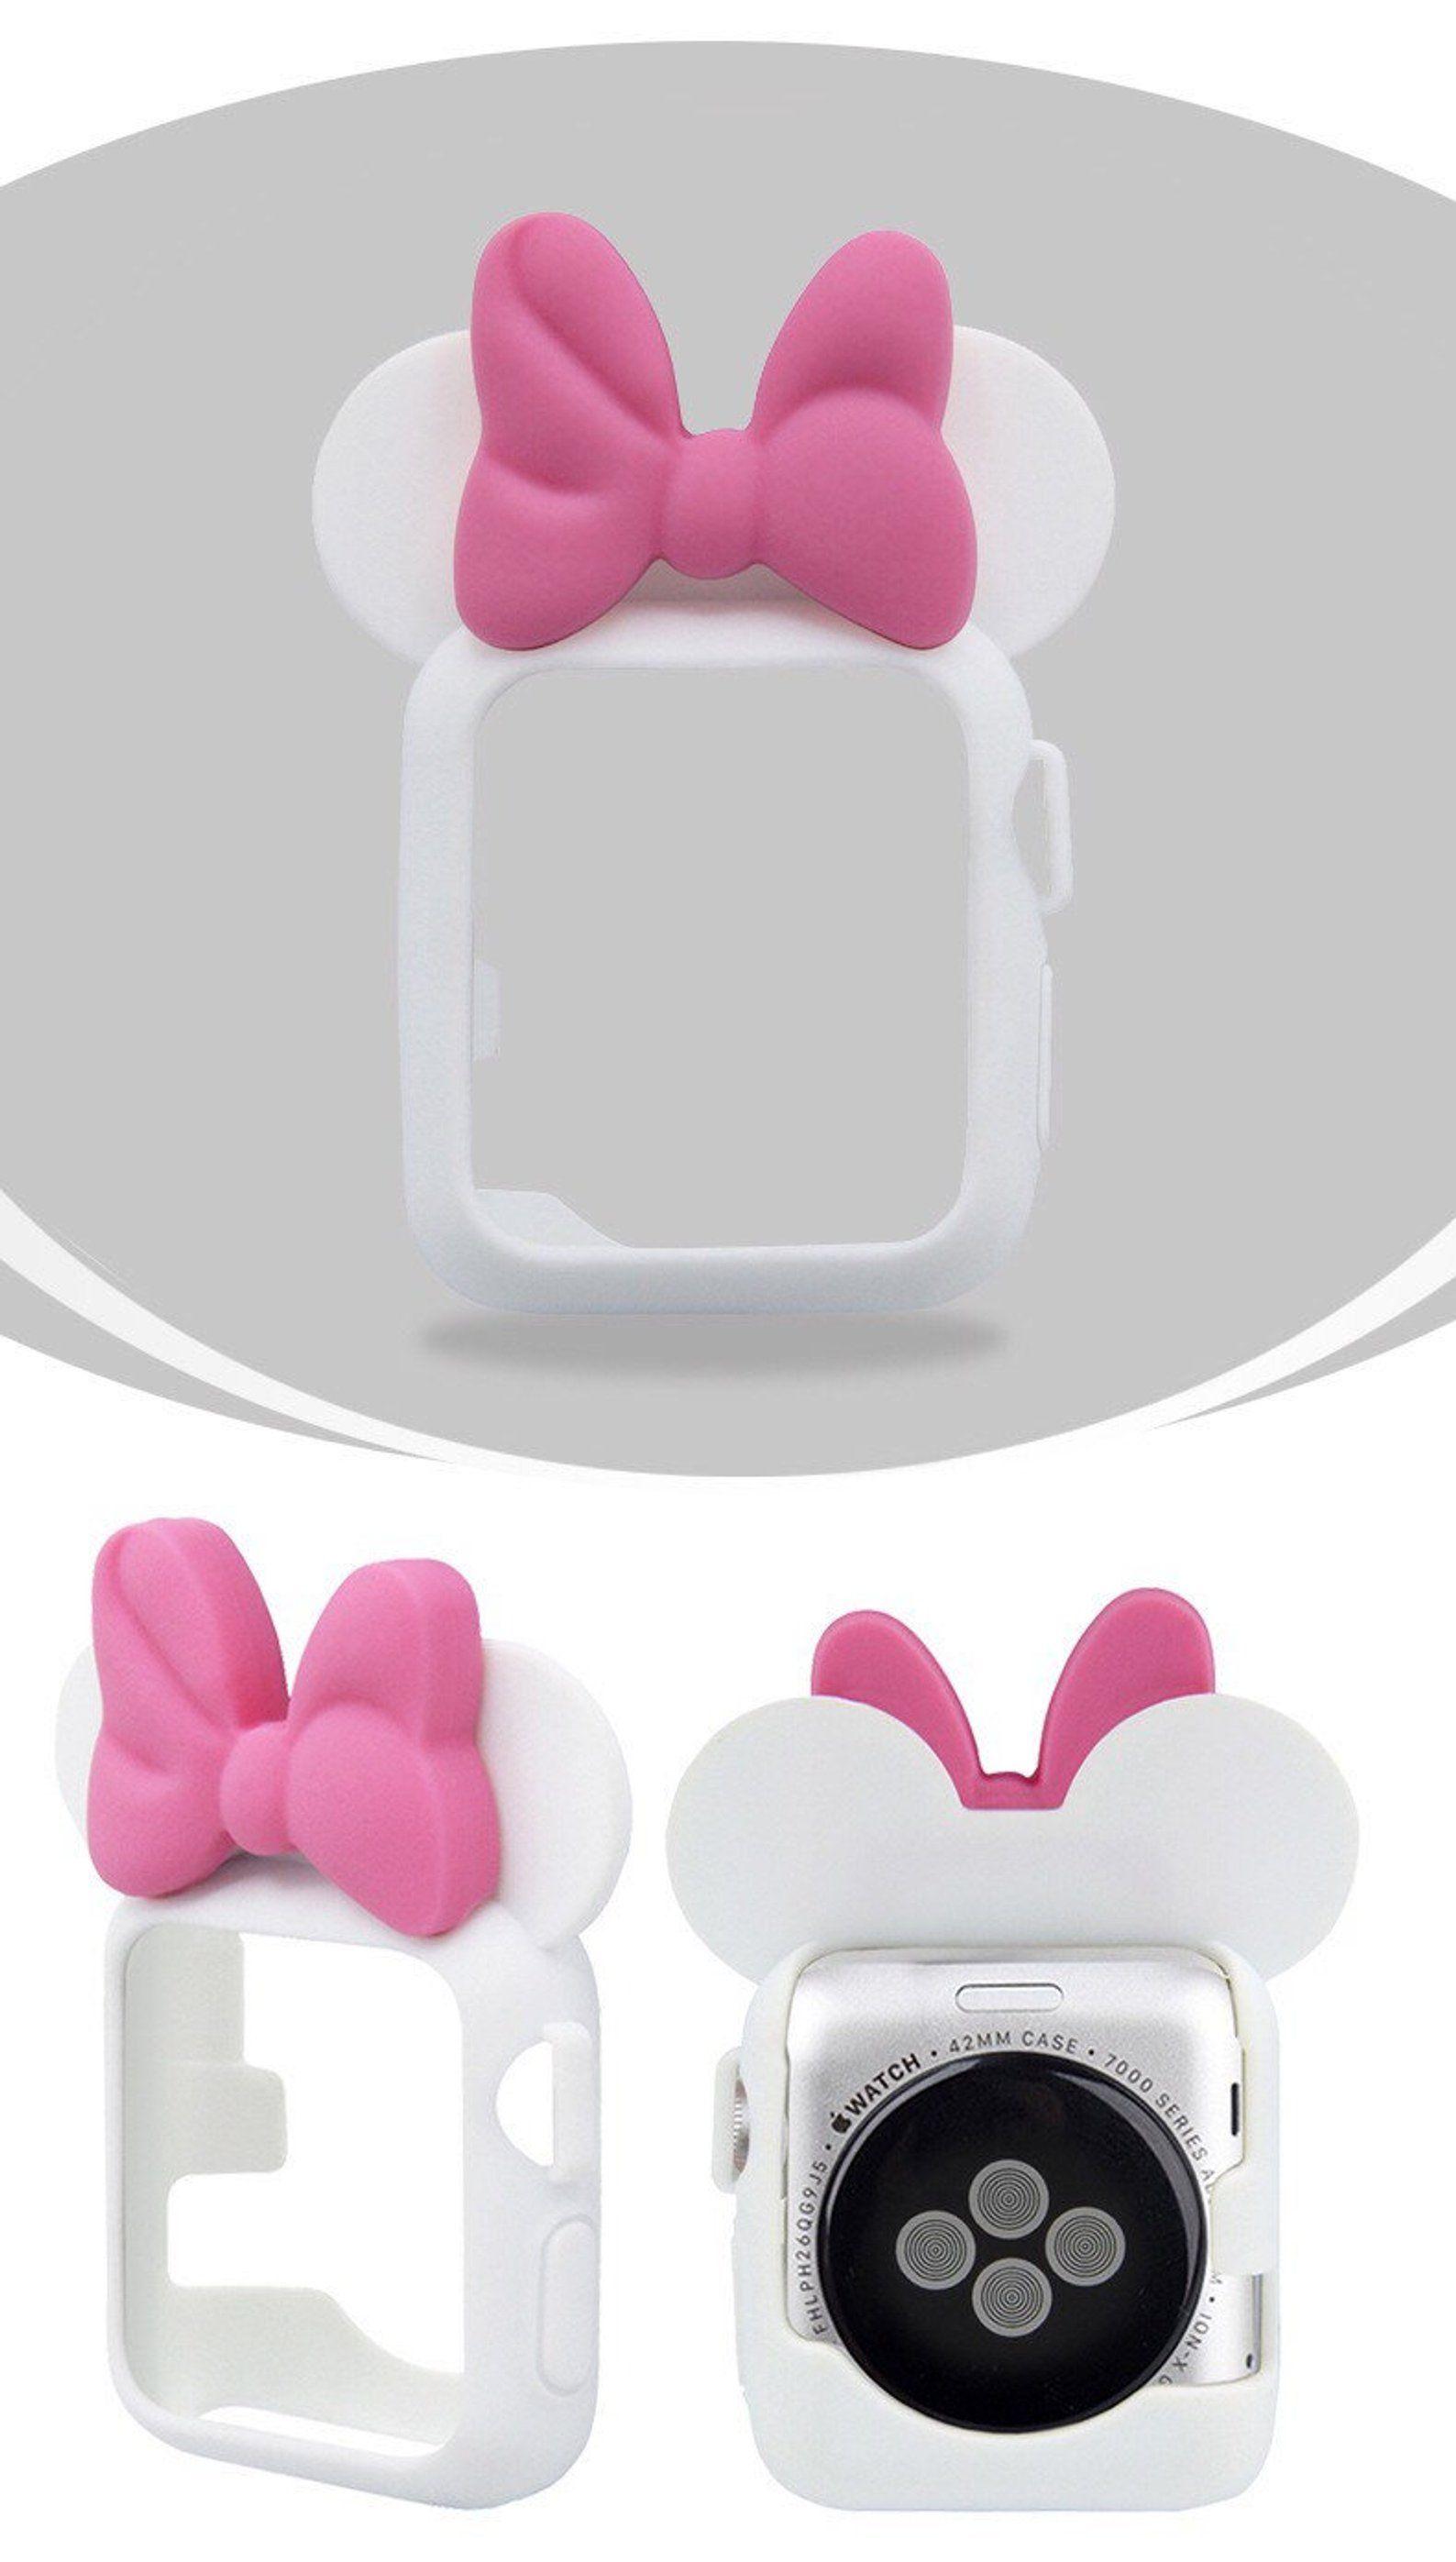 Minnie Mouse Ears. Mickey Mouse Ears. Mickey Mouse Apple